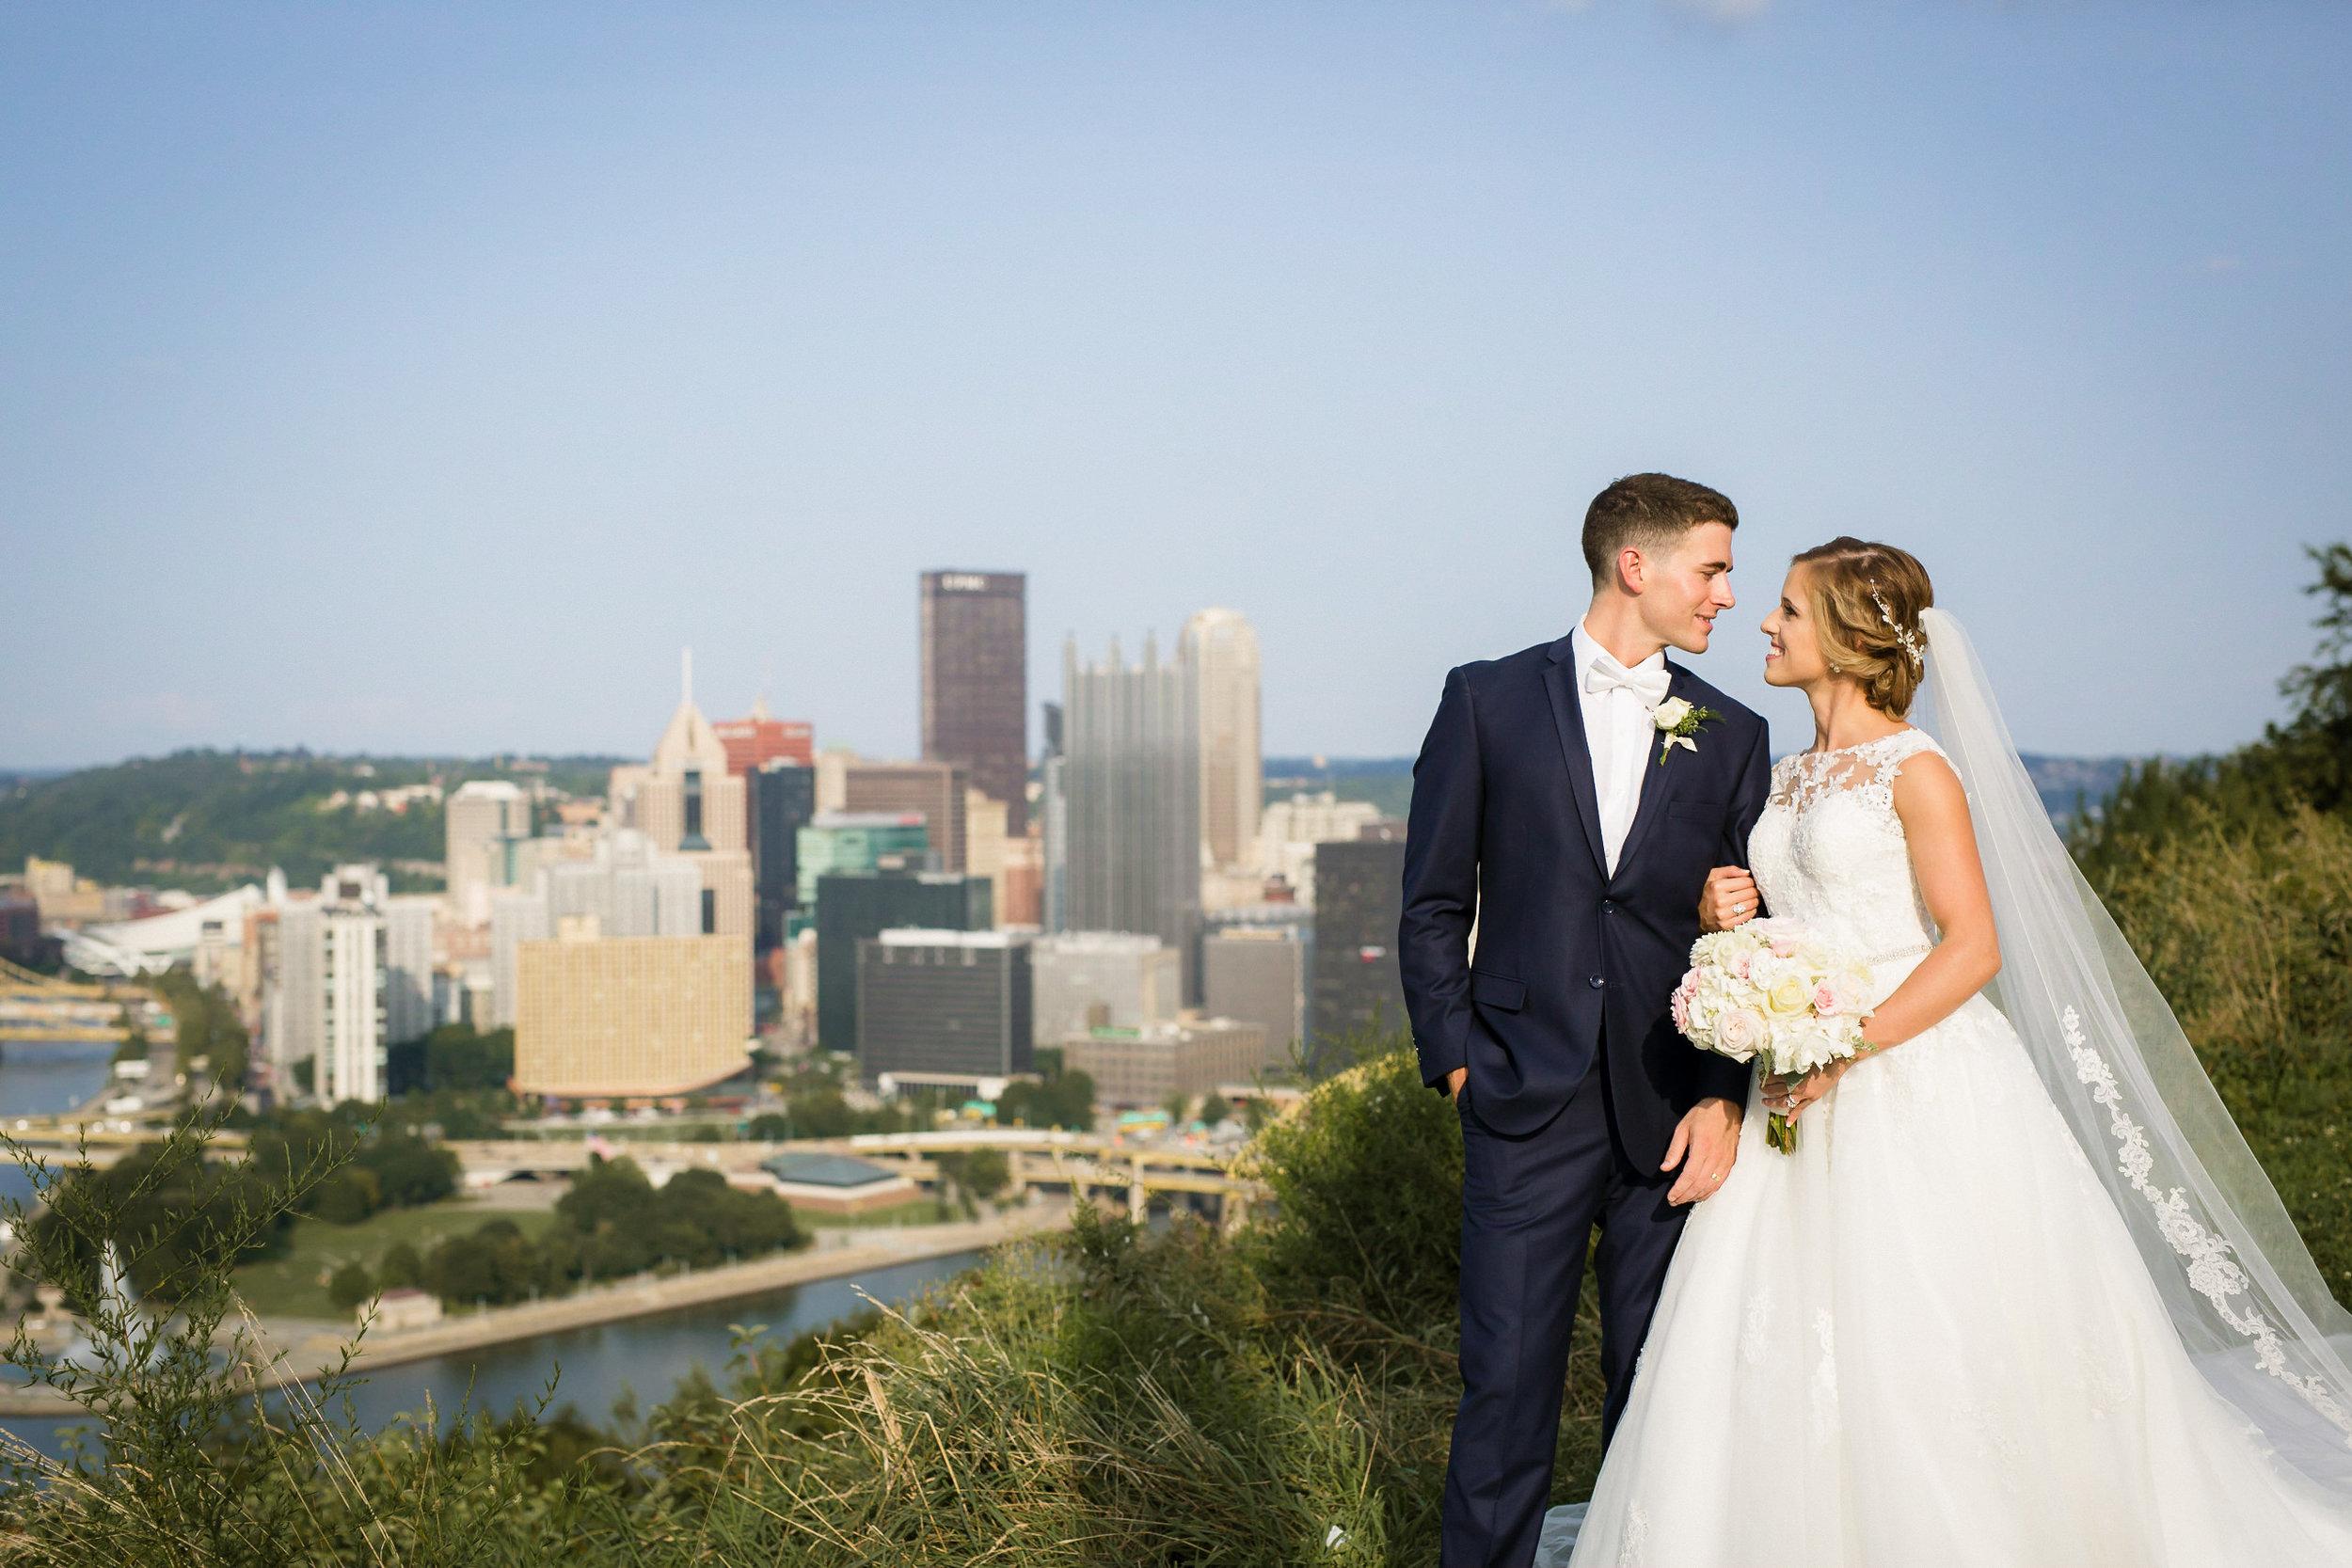 Mt Washington Wedding Engagement Picture Locations-6.jpg